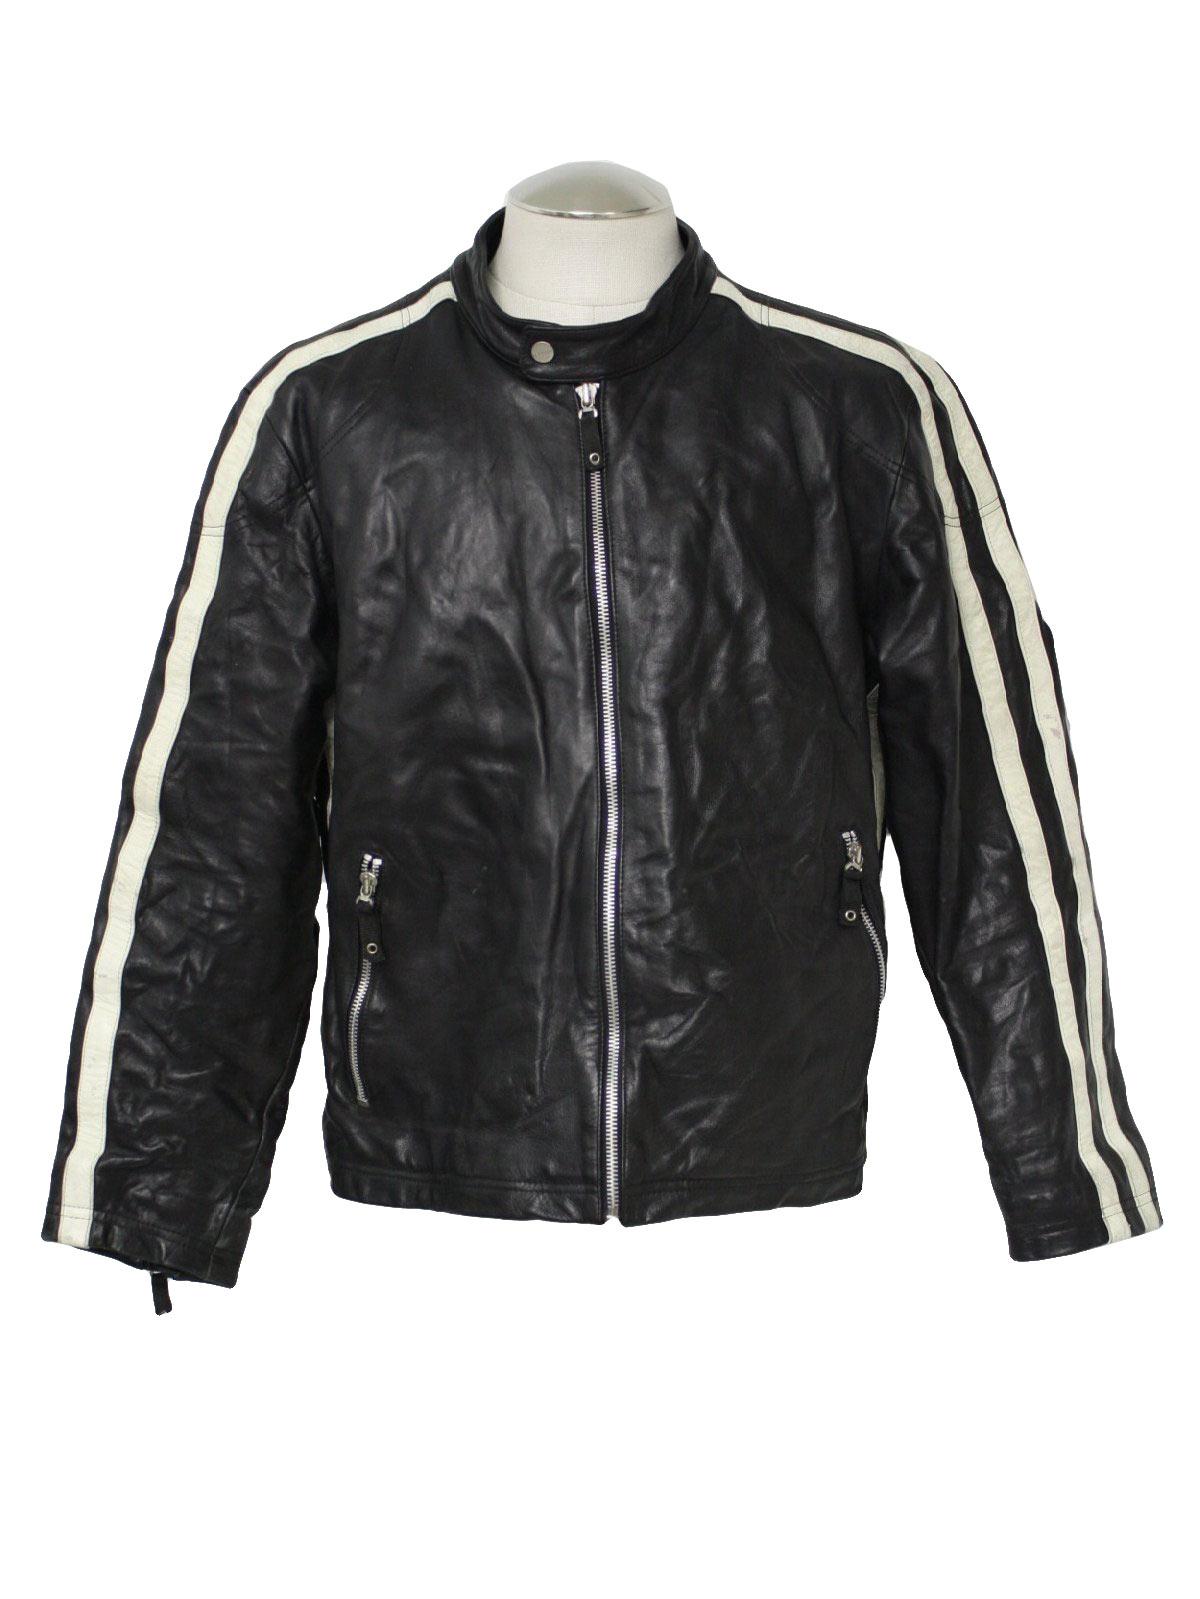 Wilson Leather Jacket Mens - Jacket